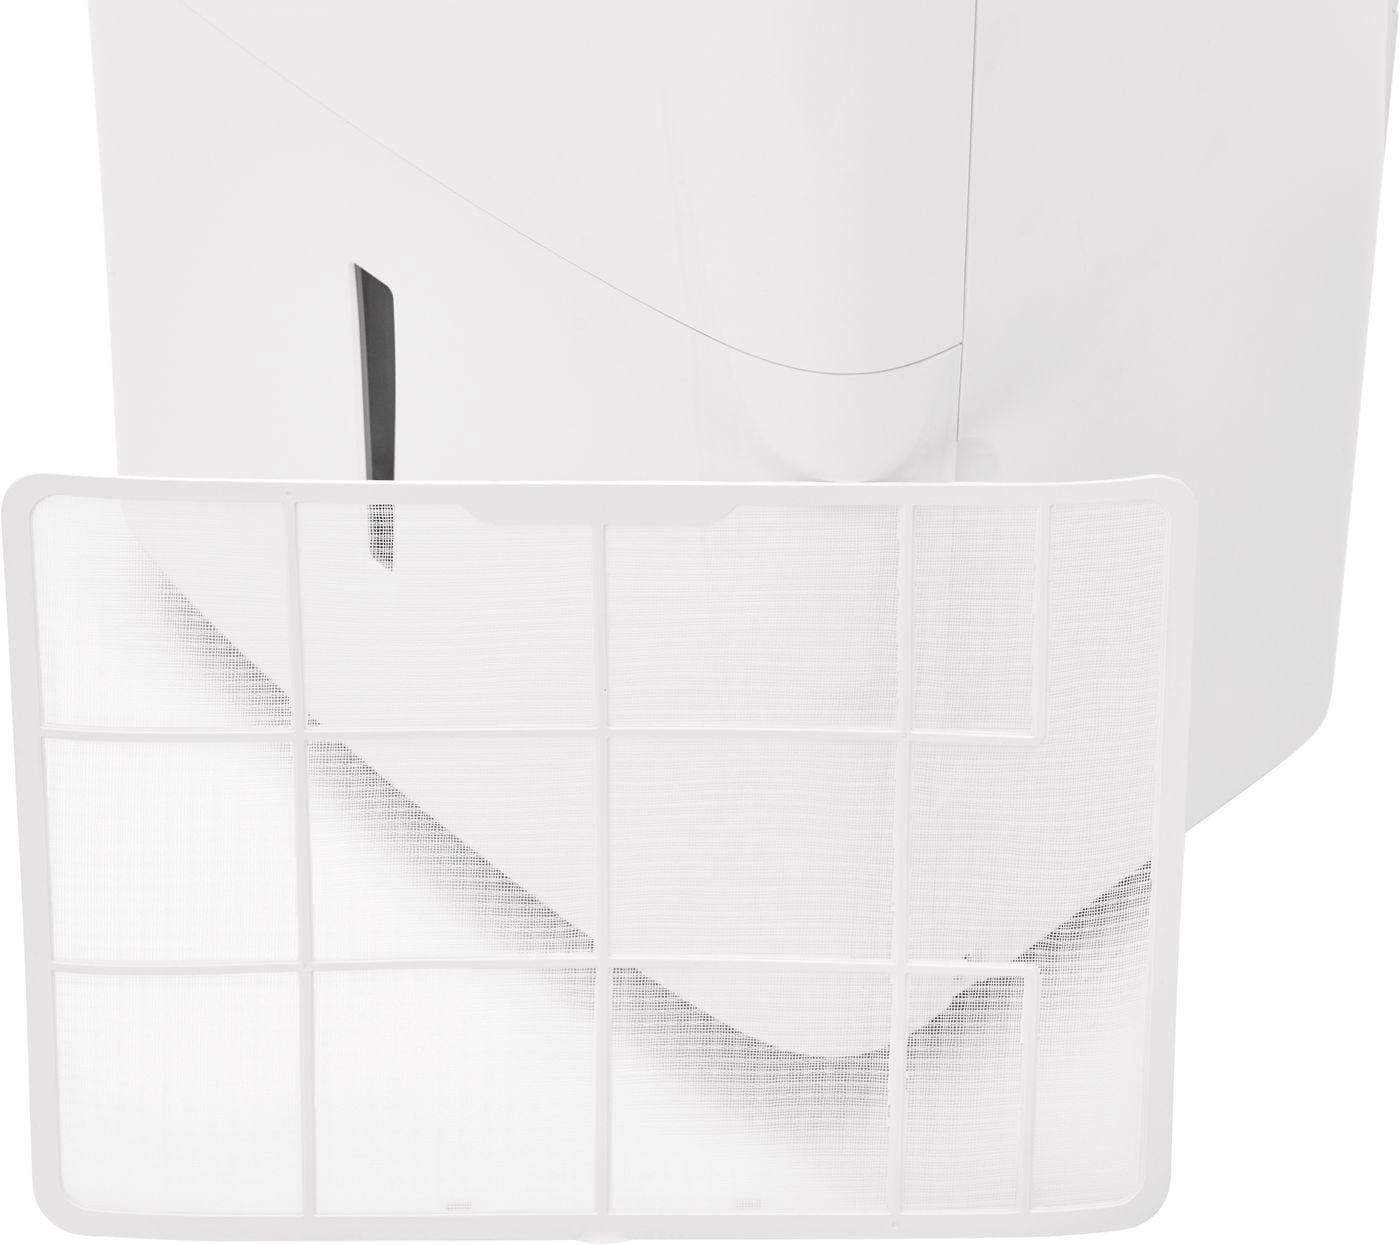 Model: FFAP5033W1 | Frigidaire High Humidity 50 Pint Capacity Dehumidifier with Built In Pump